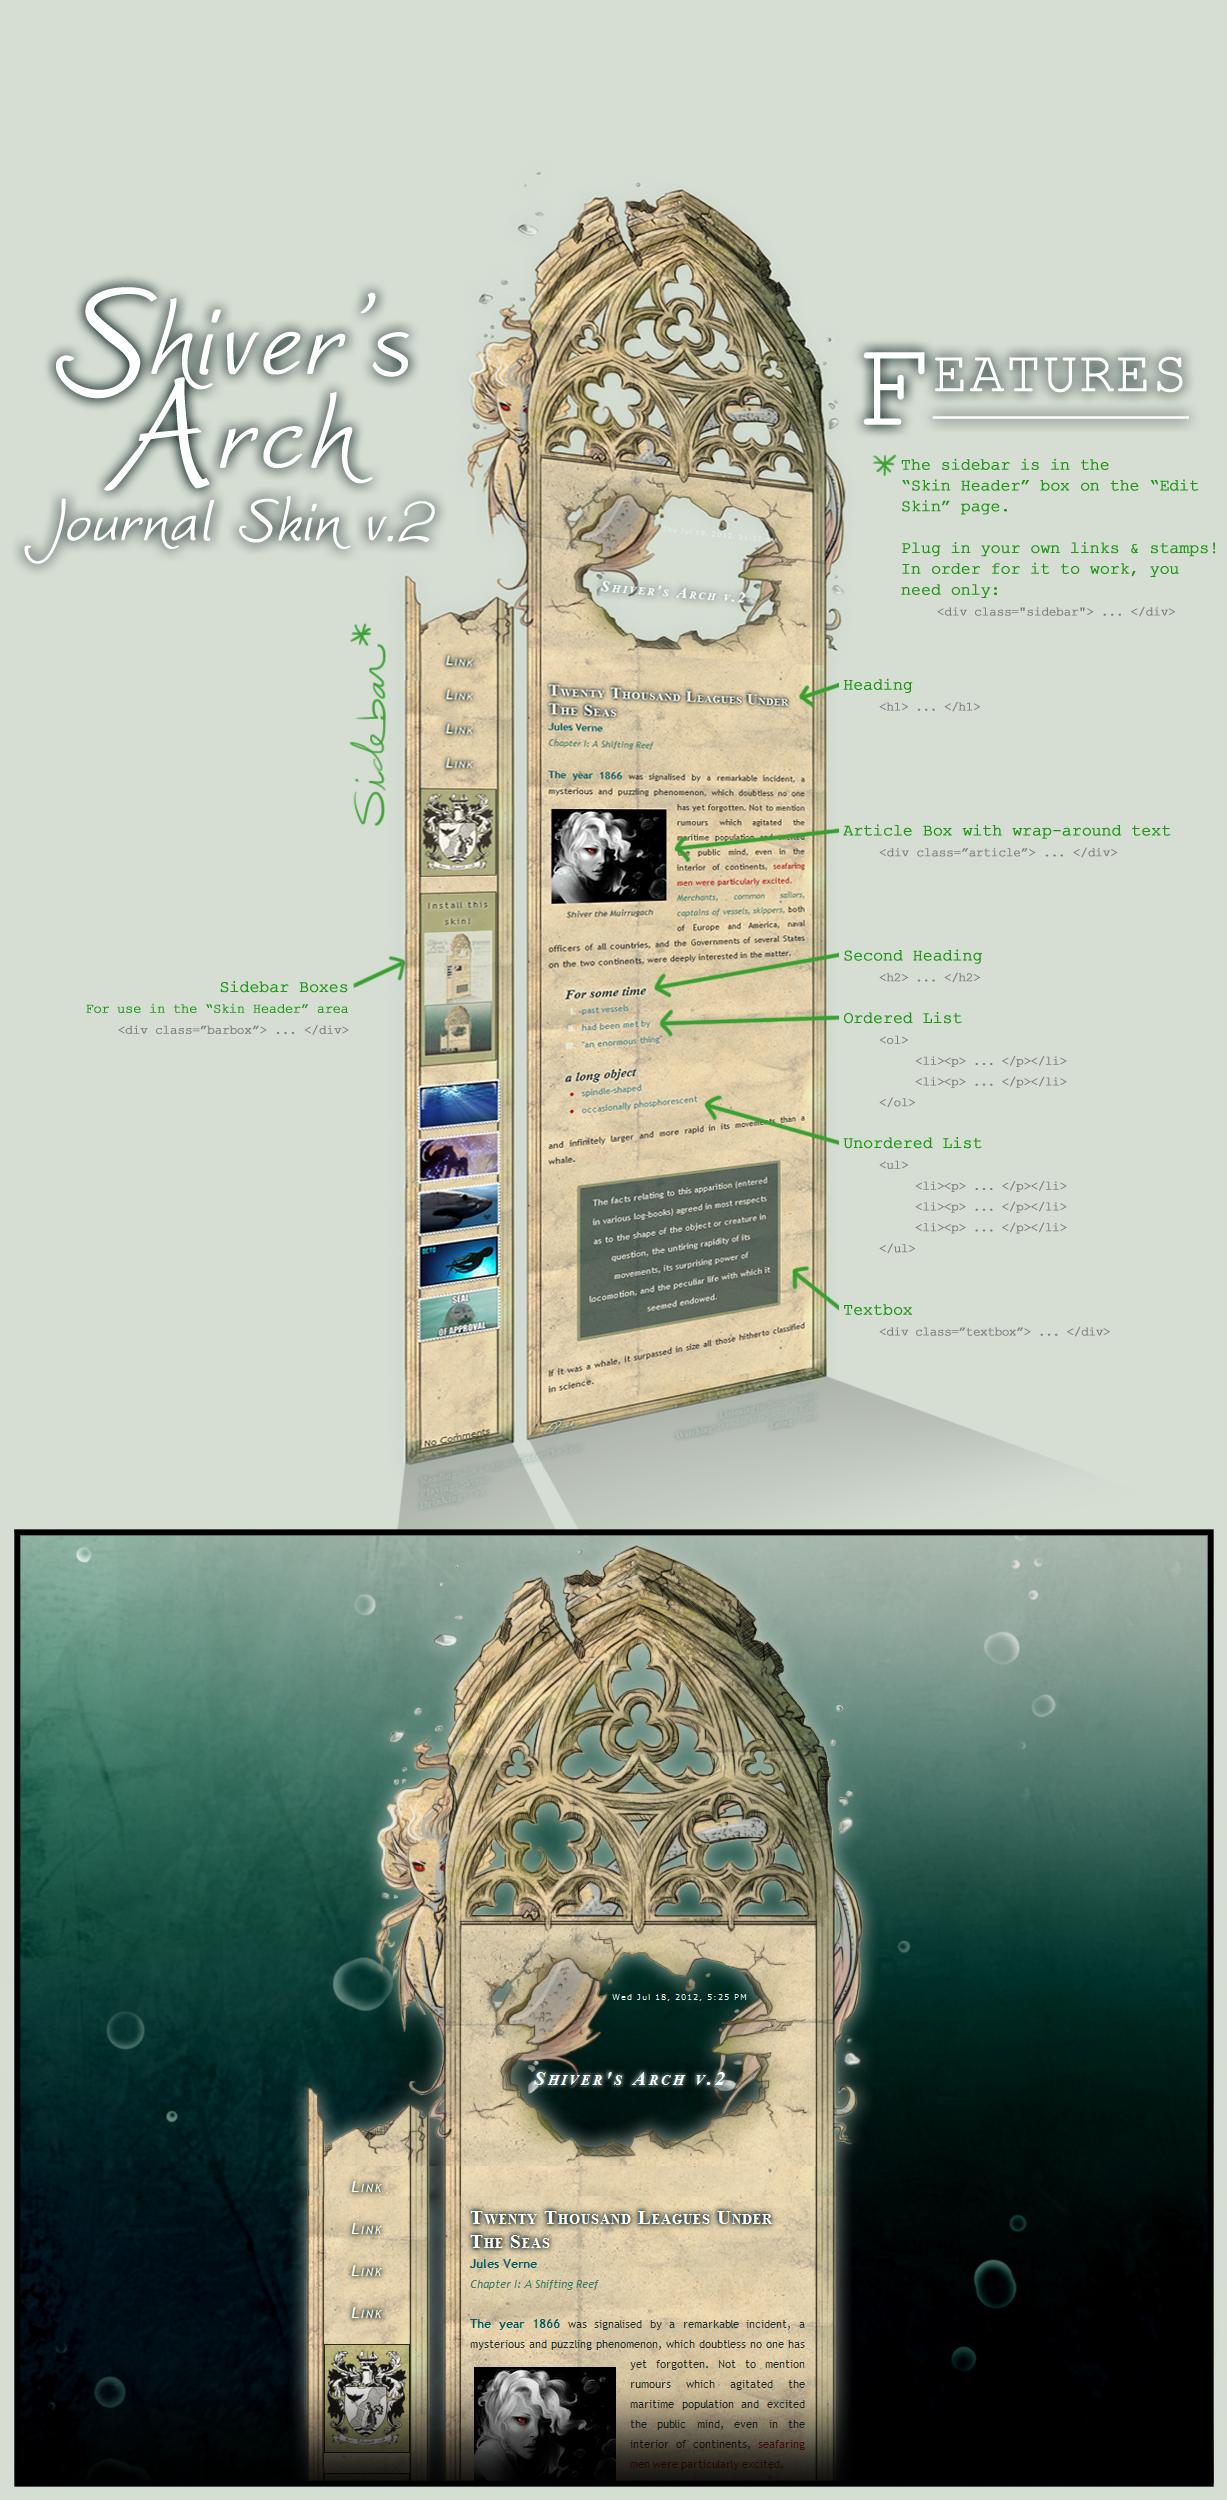 Shiver's Arch v.2 by Pyek